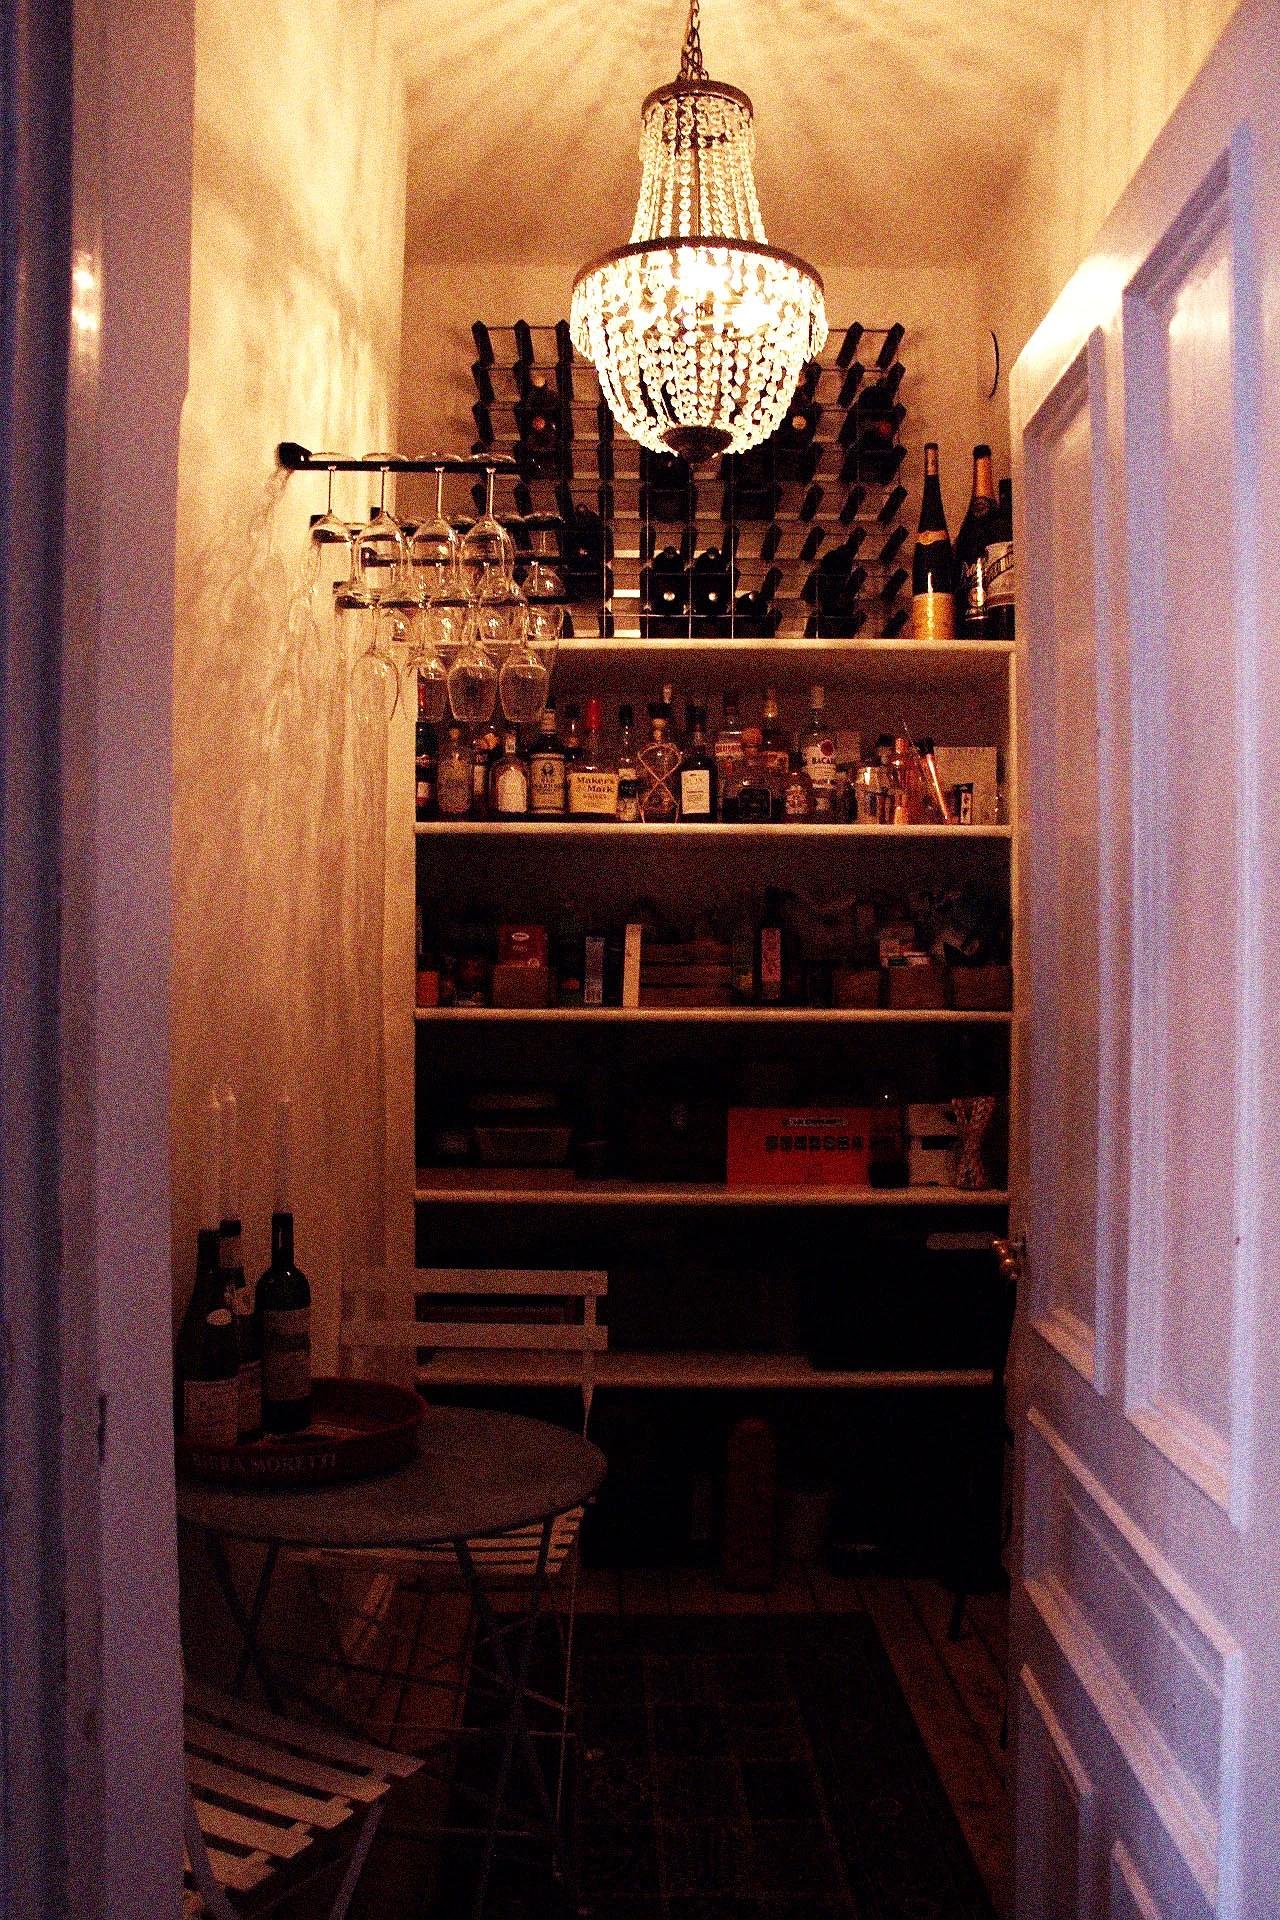 Take a look: pantry